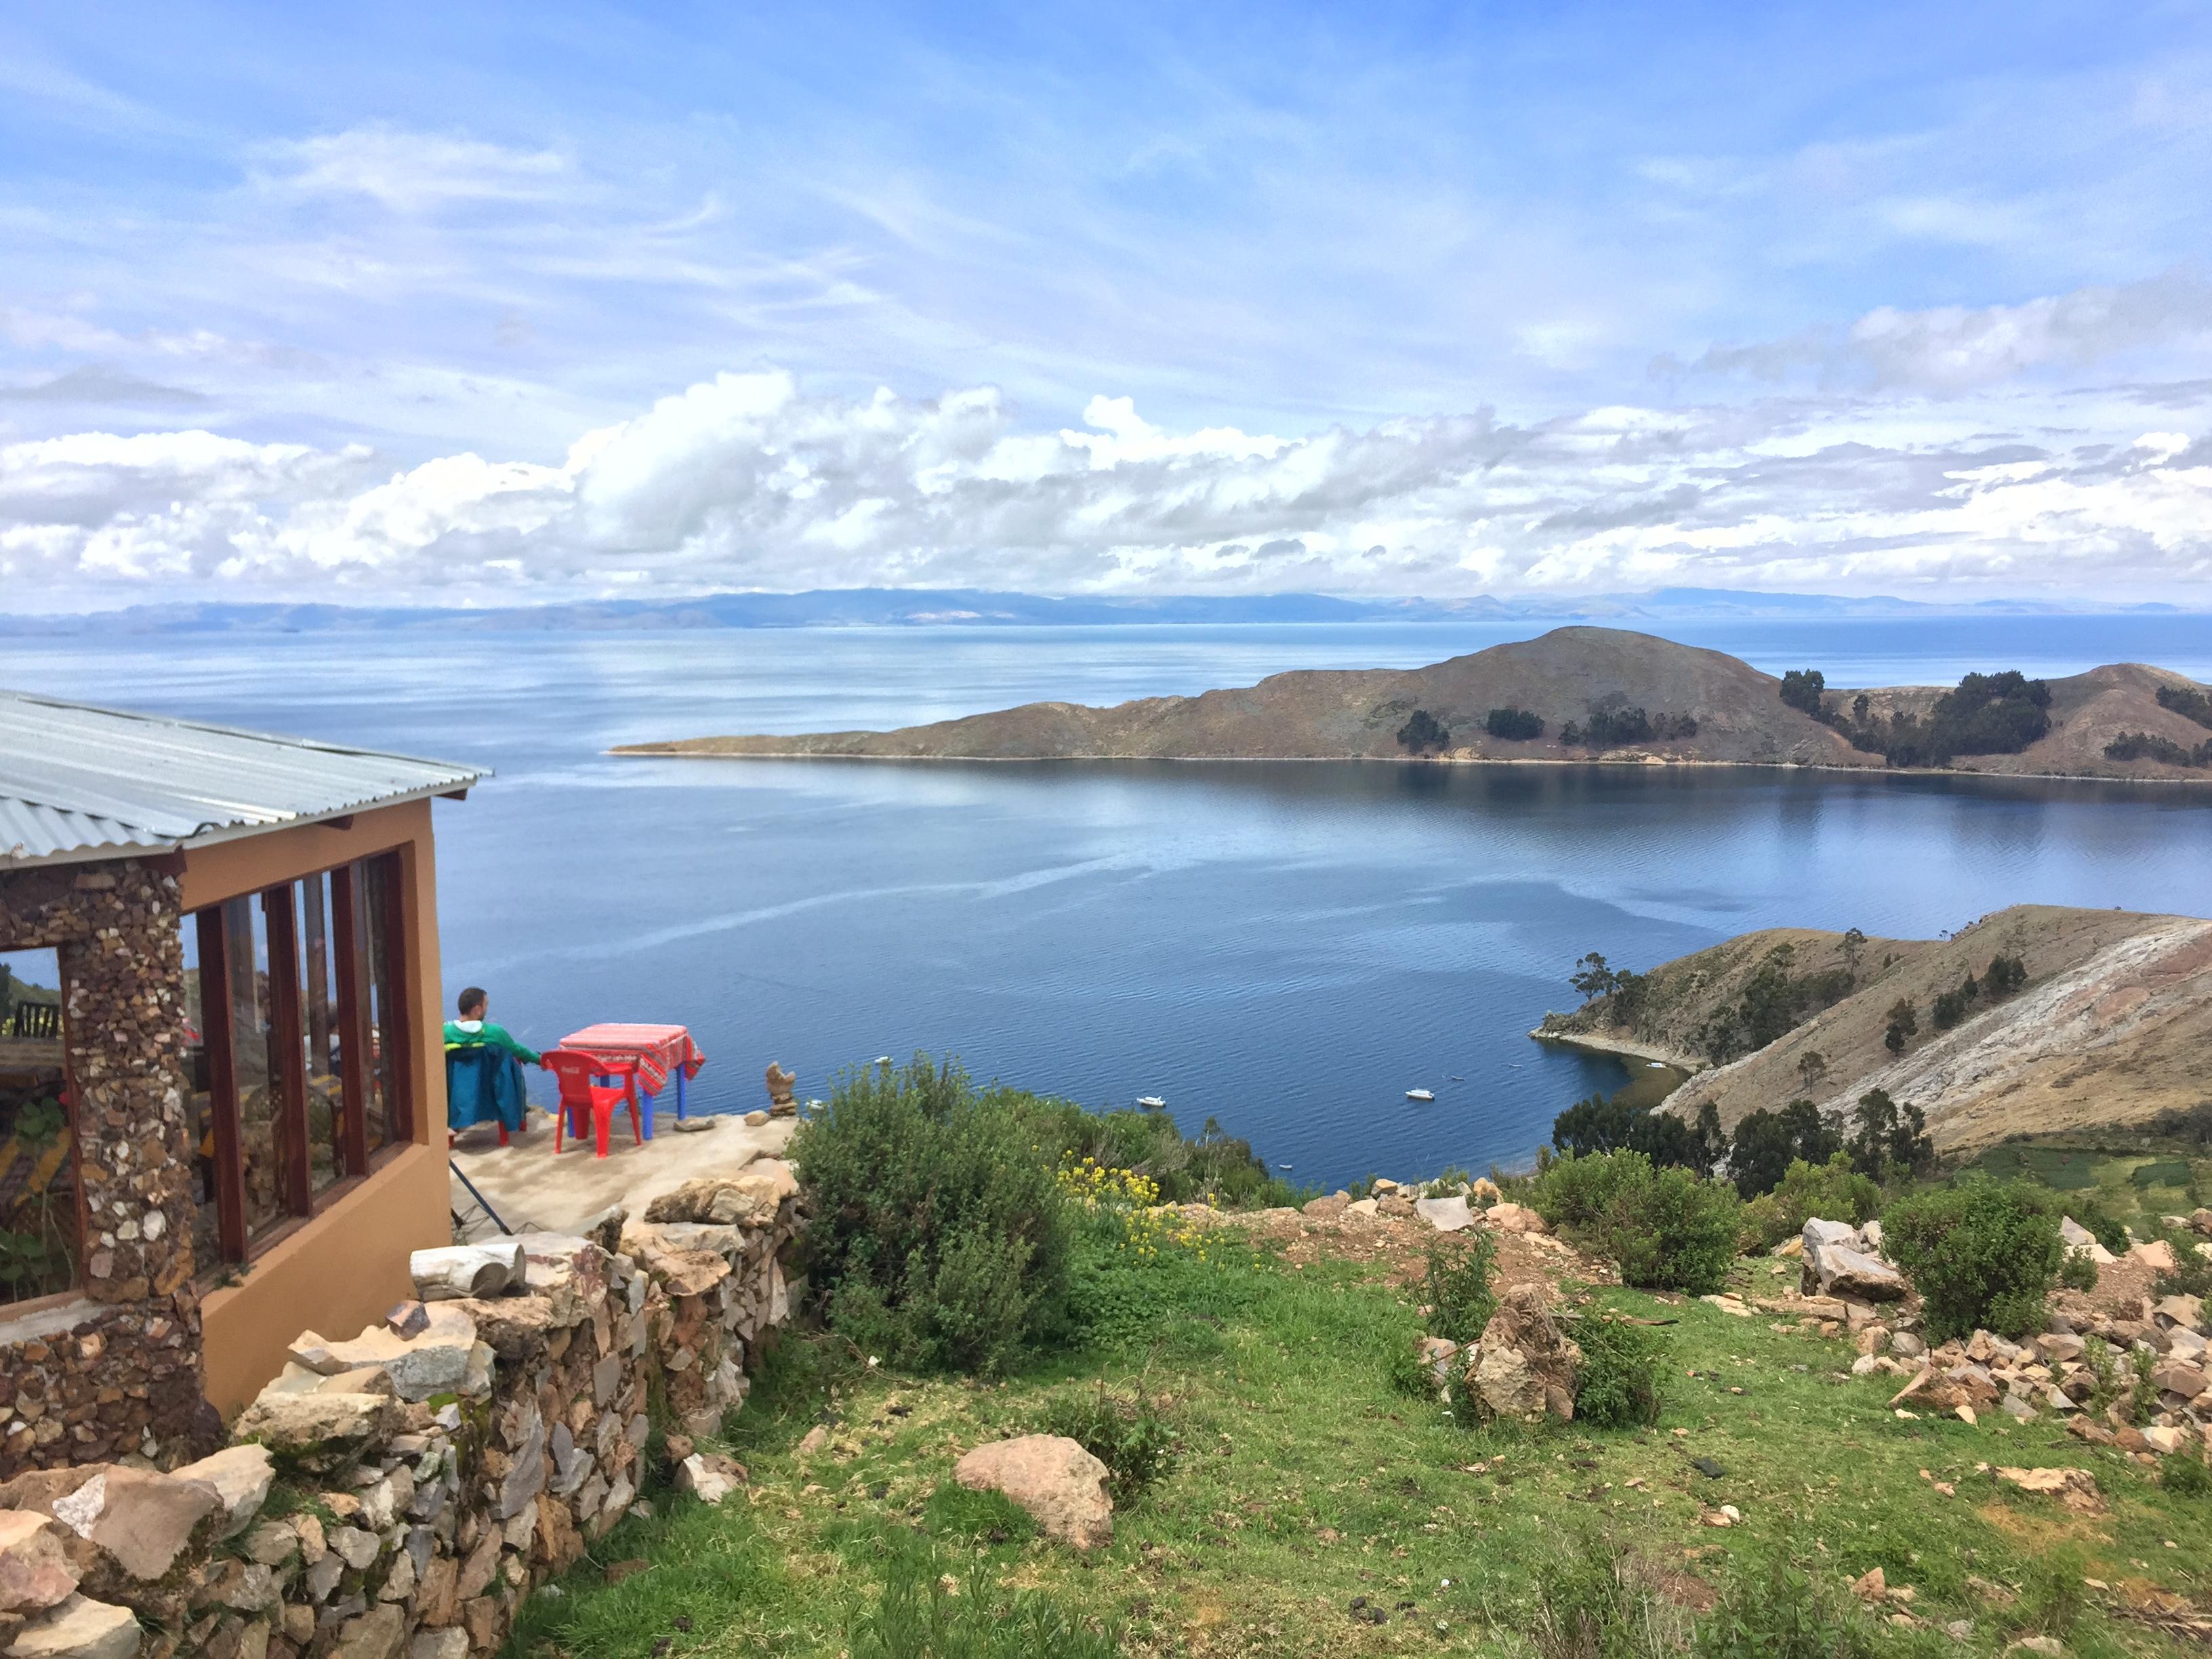 EP22. 볼리비아를 여행한다는 것 - 바다 없는 나라...